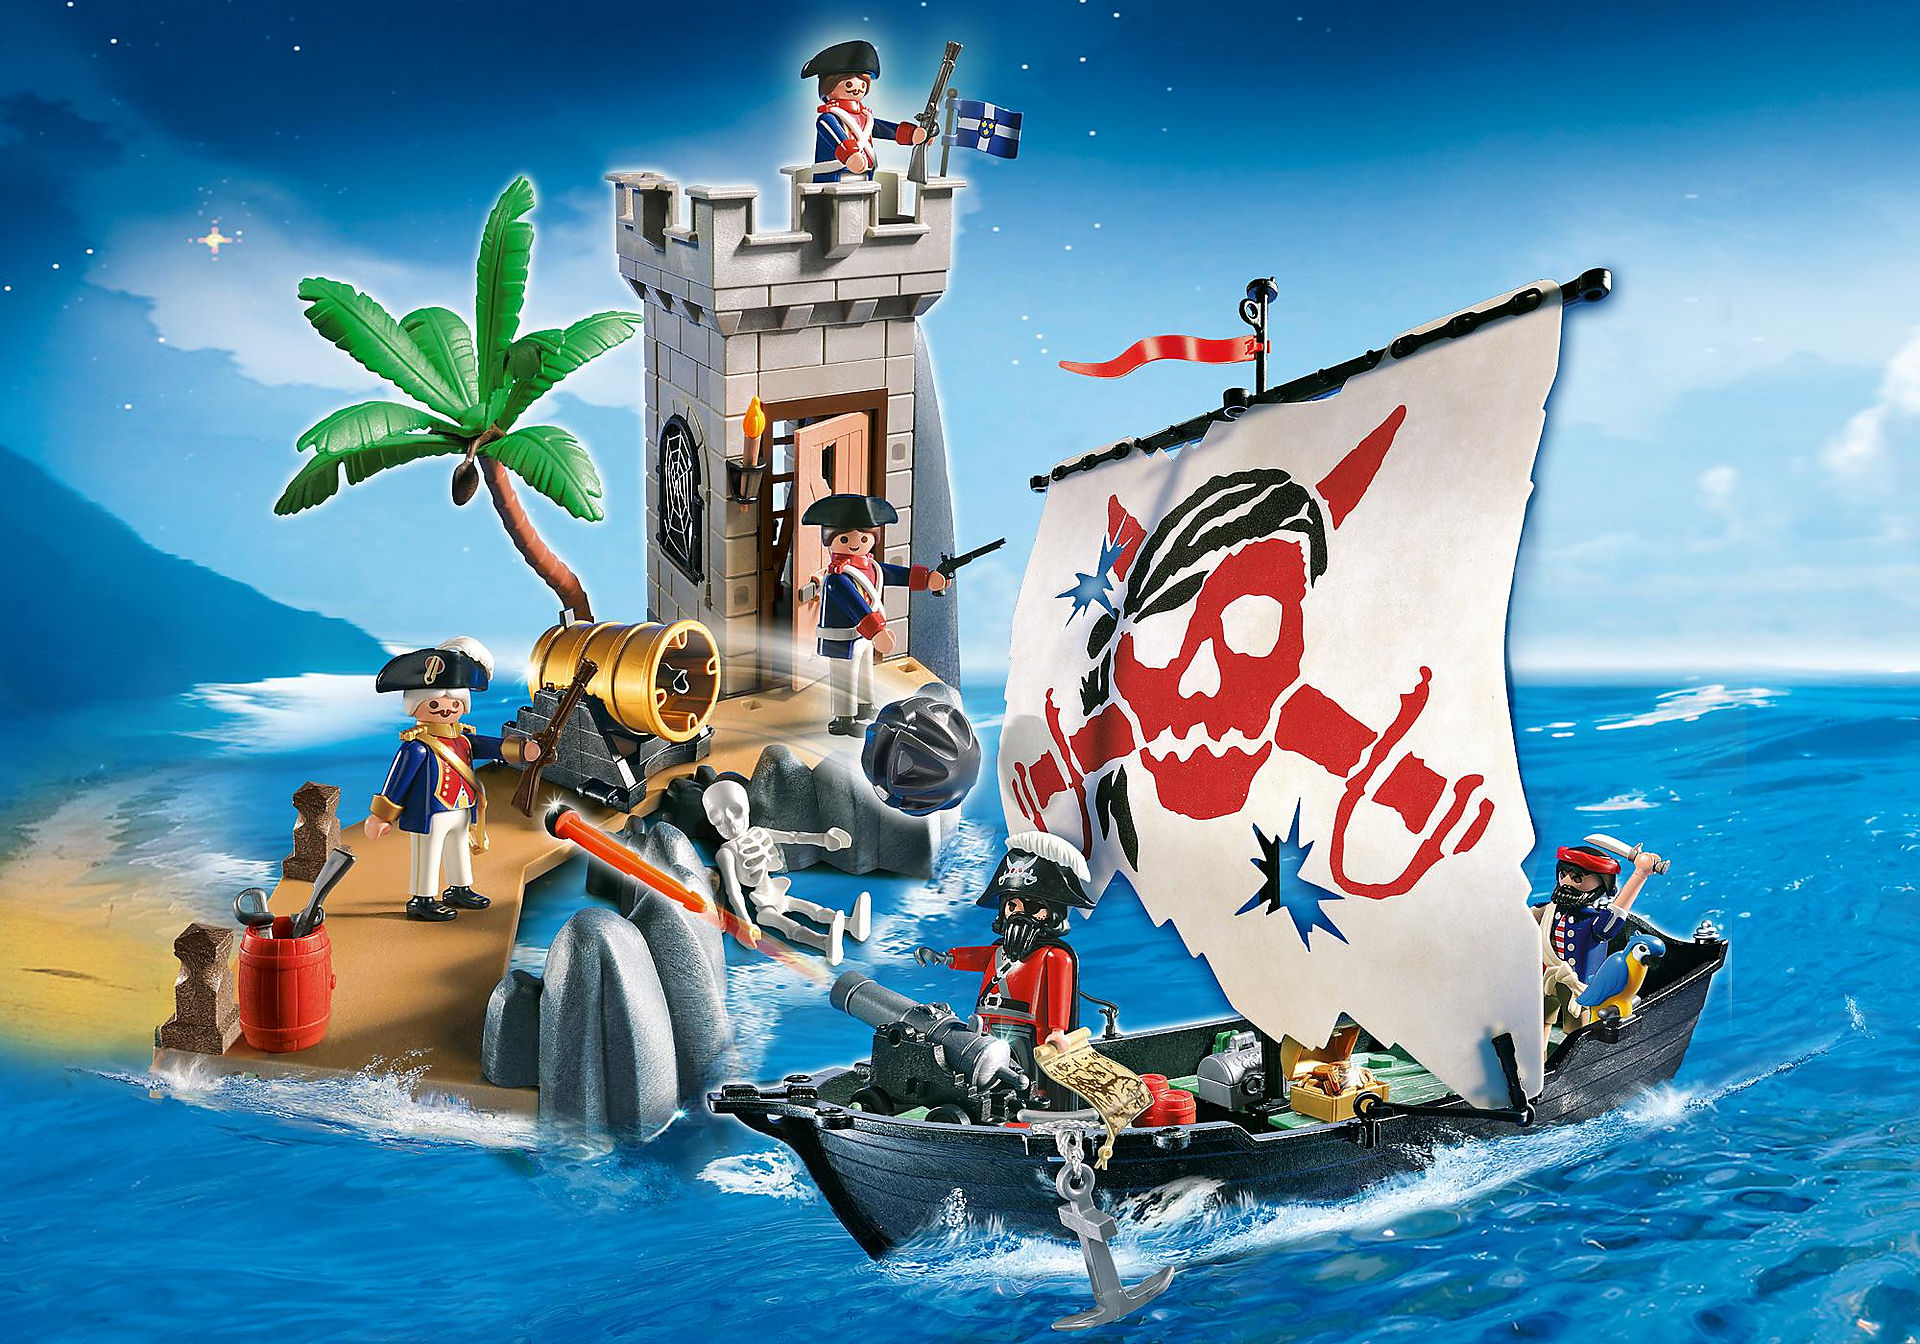 5919 Pirate Bastion Set zoom image1